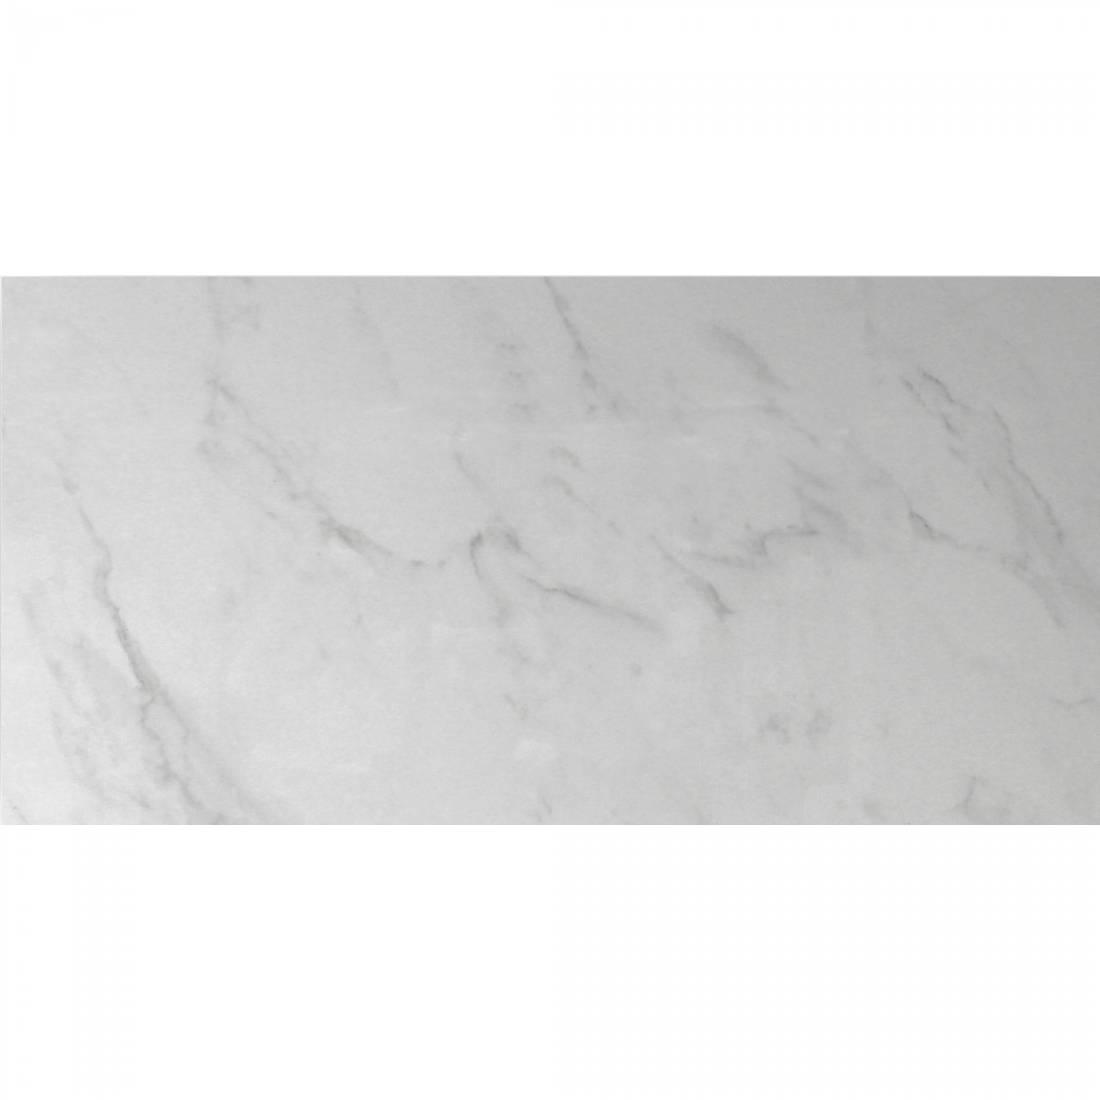 Carrara 30x60 White Gloss 1